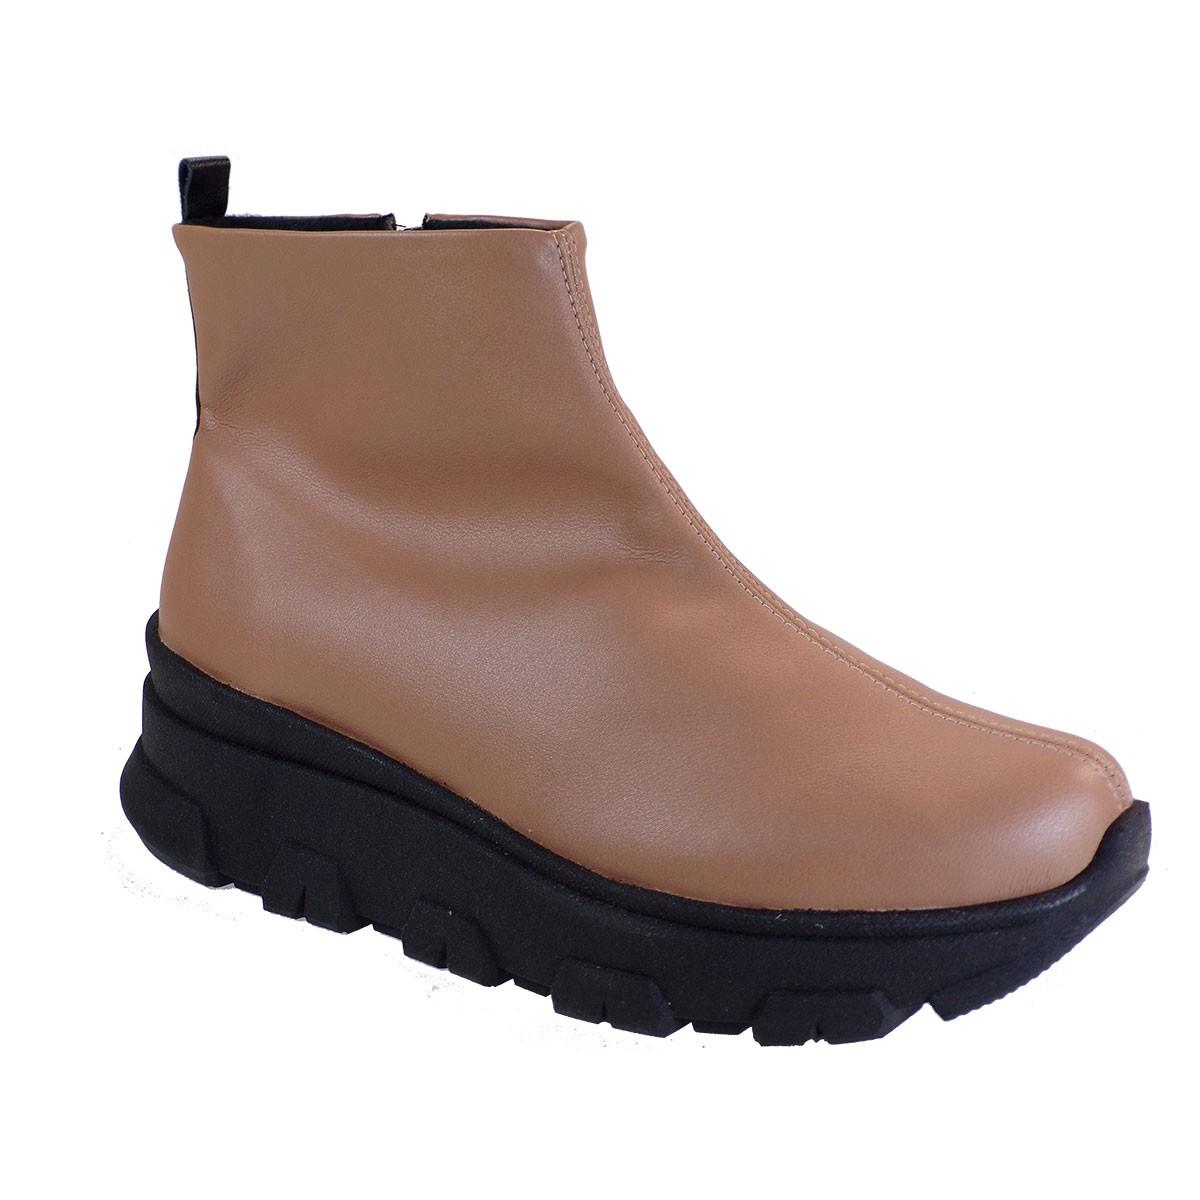 PICCADILLY Γυναικεία Παπούτσια Μποτάκια Ανατoμικά 358005-1 Πούδρα